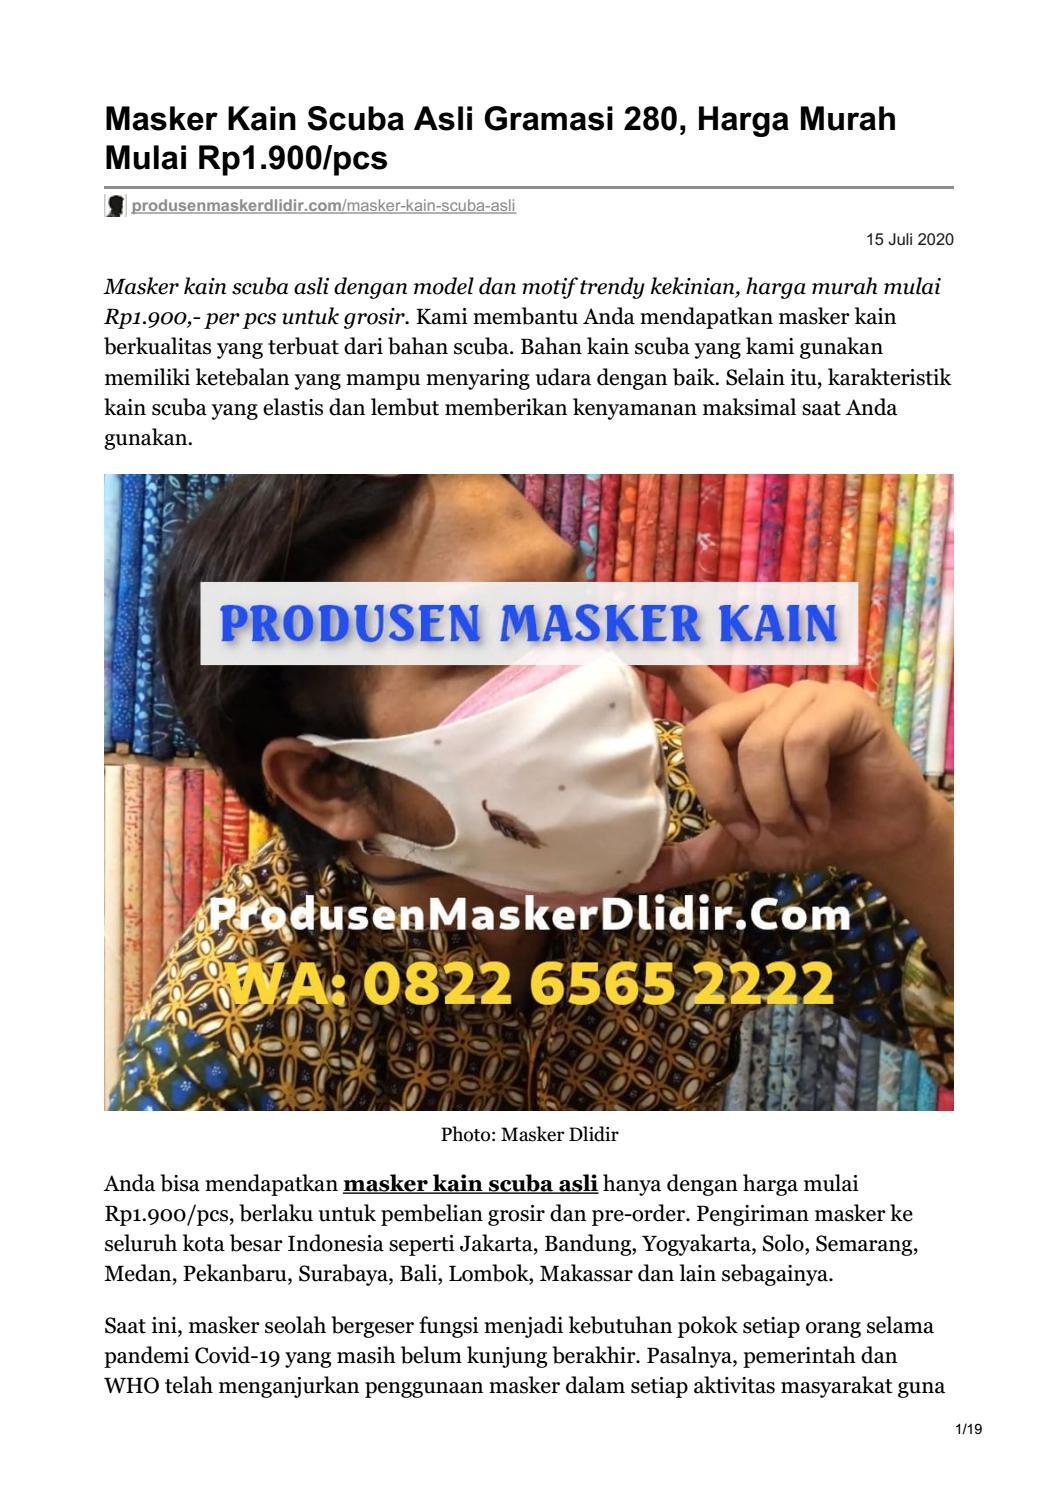 Produsen Masker Kain Scuba Asli Wa 0822 6565 2222 Harga Murah Rp1 600 Pcs Dengan Minimal Order By Kontraktor Solo Issuu